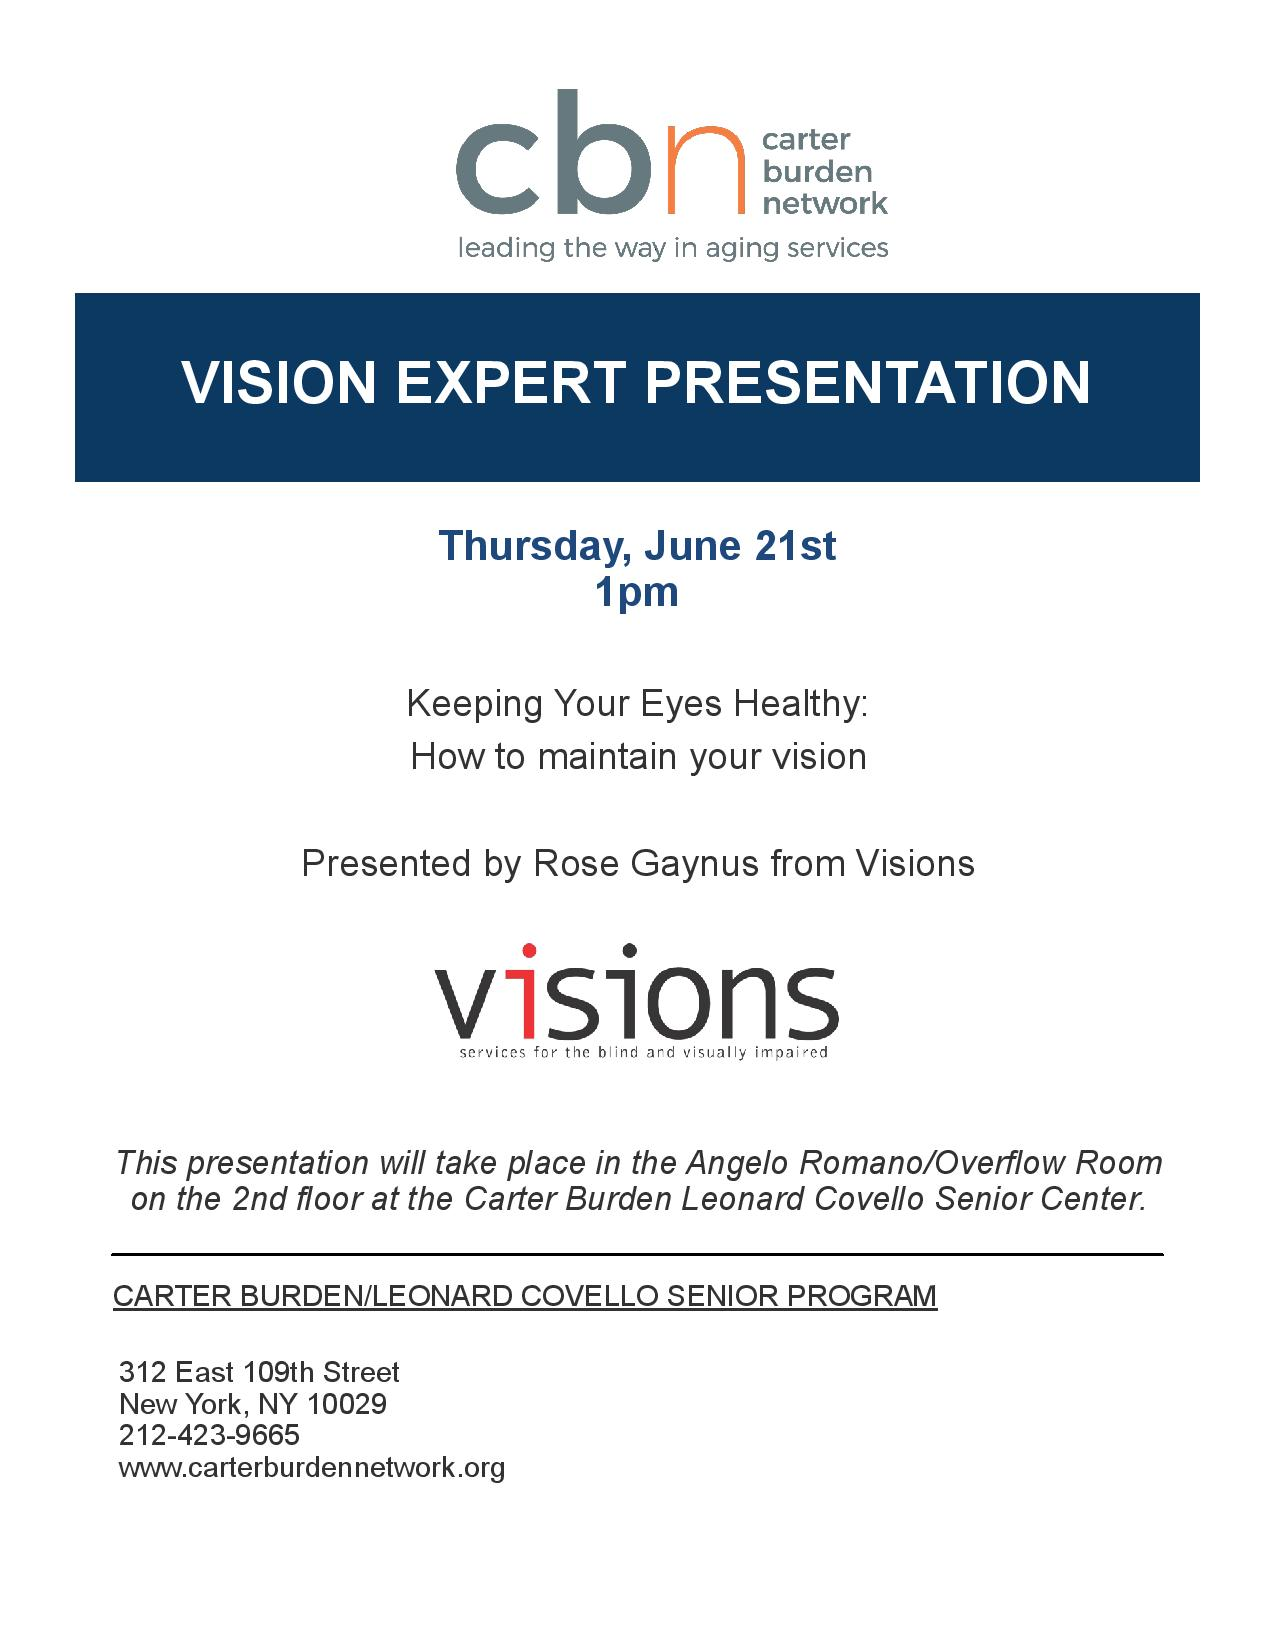 Vision Expert Flyer 6.21.18-page-001.jpg